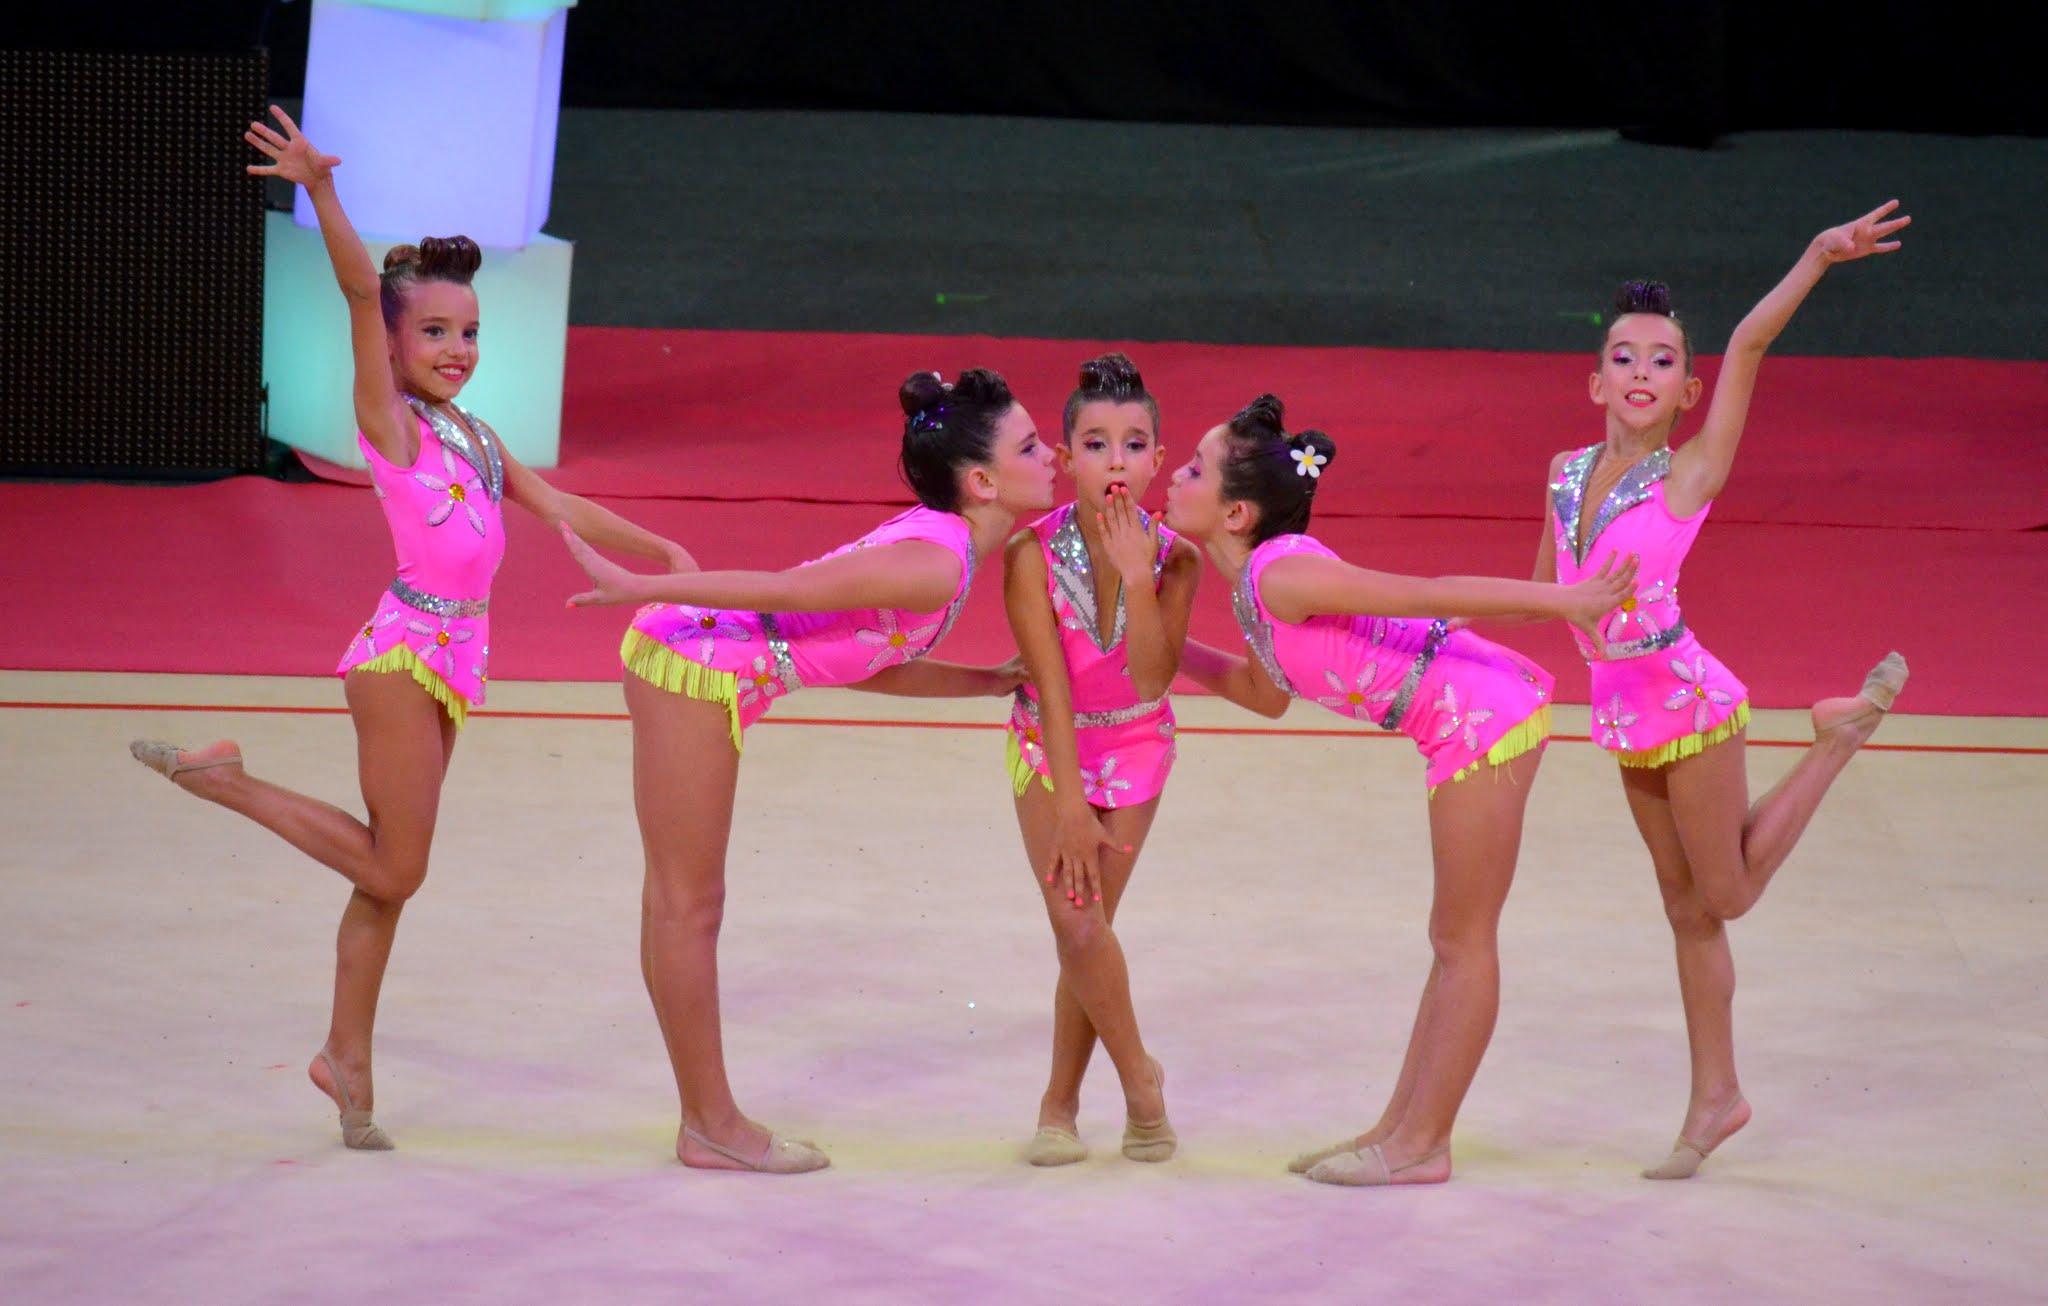 Club escuela zaragoza for Deportes de gimnasia